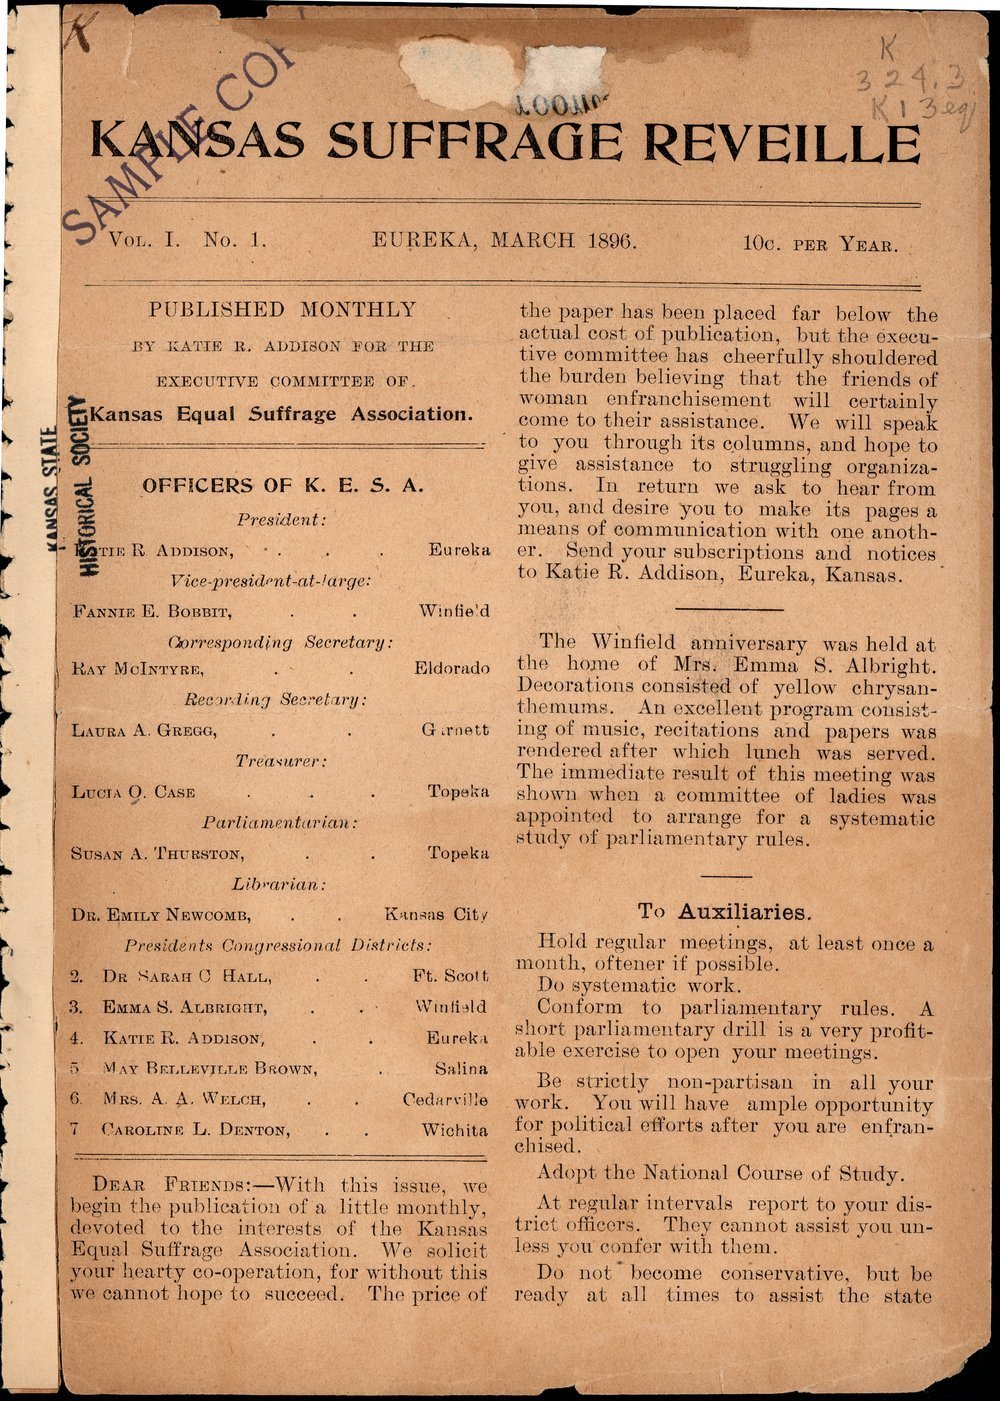 Kansas Suffrage Reveille: organ of the Kansas Equal Suffrage Association - 1